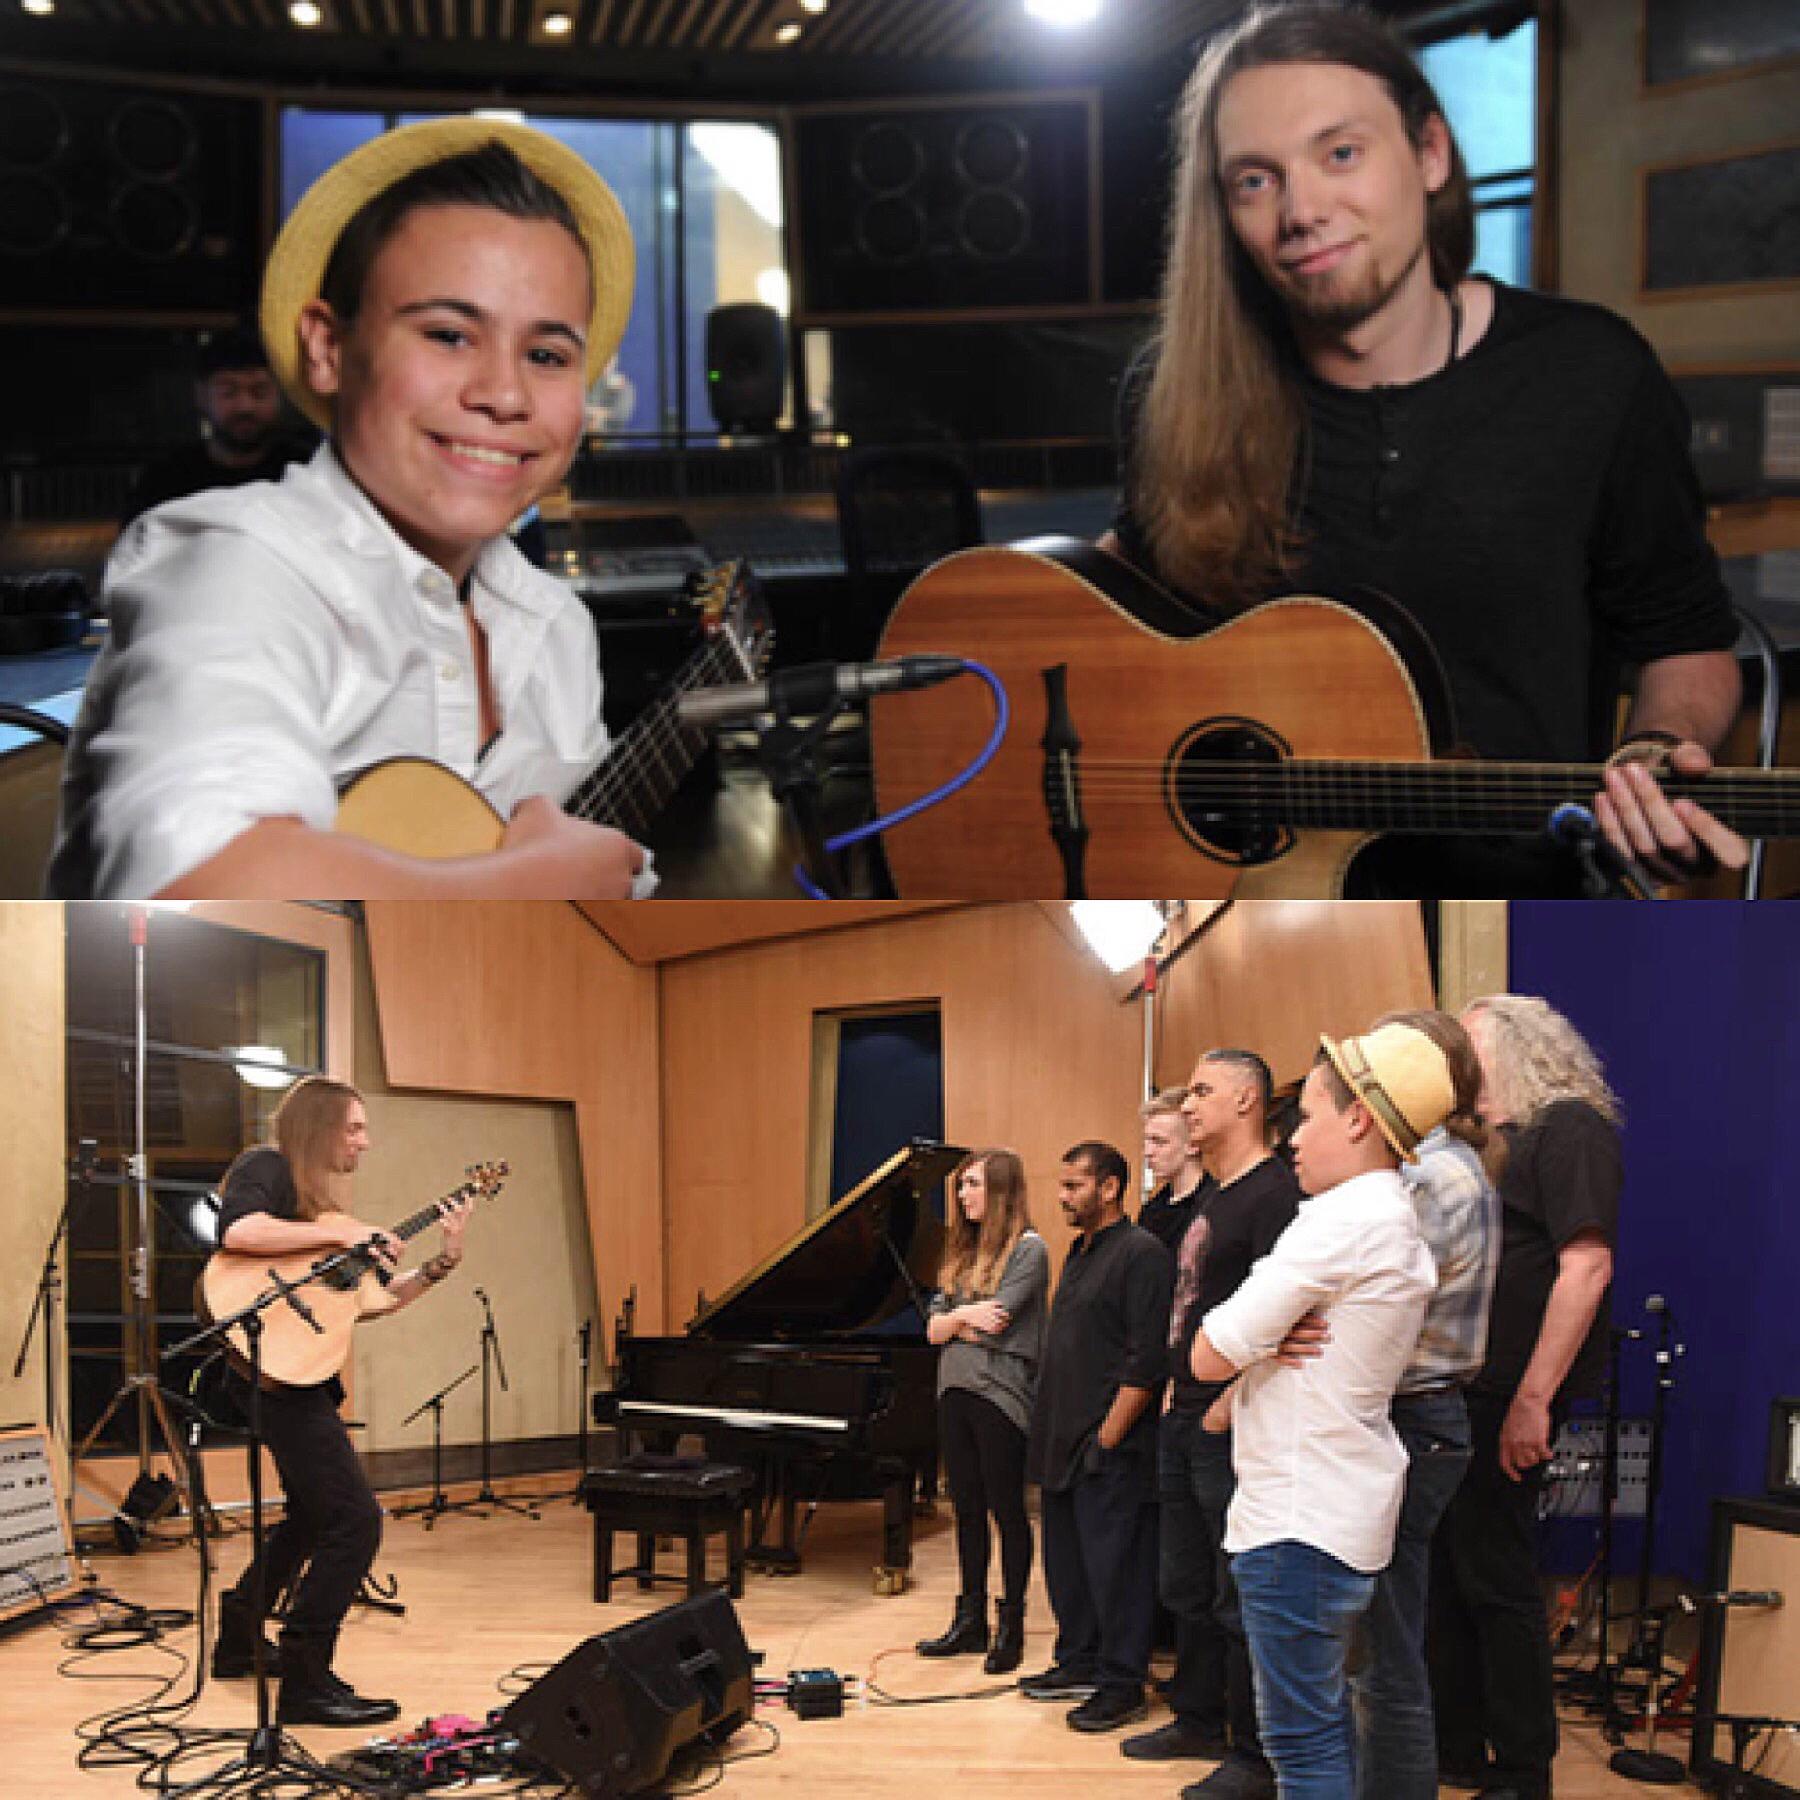 Mentoring on Sky TV's 'Guitar Star'